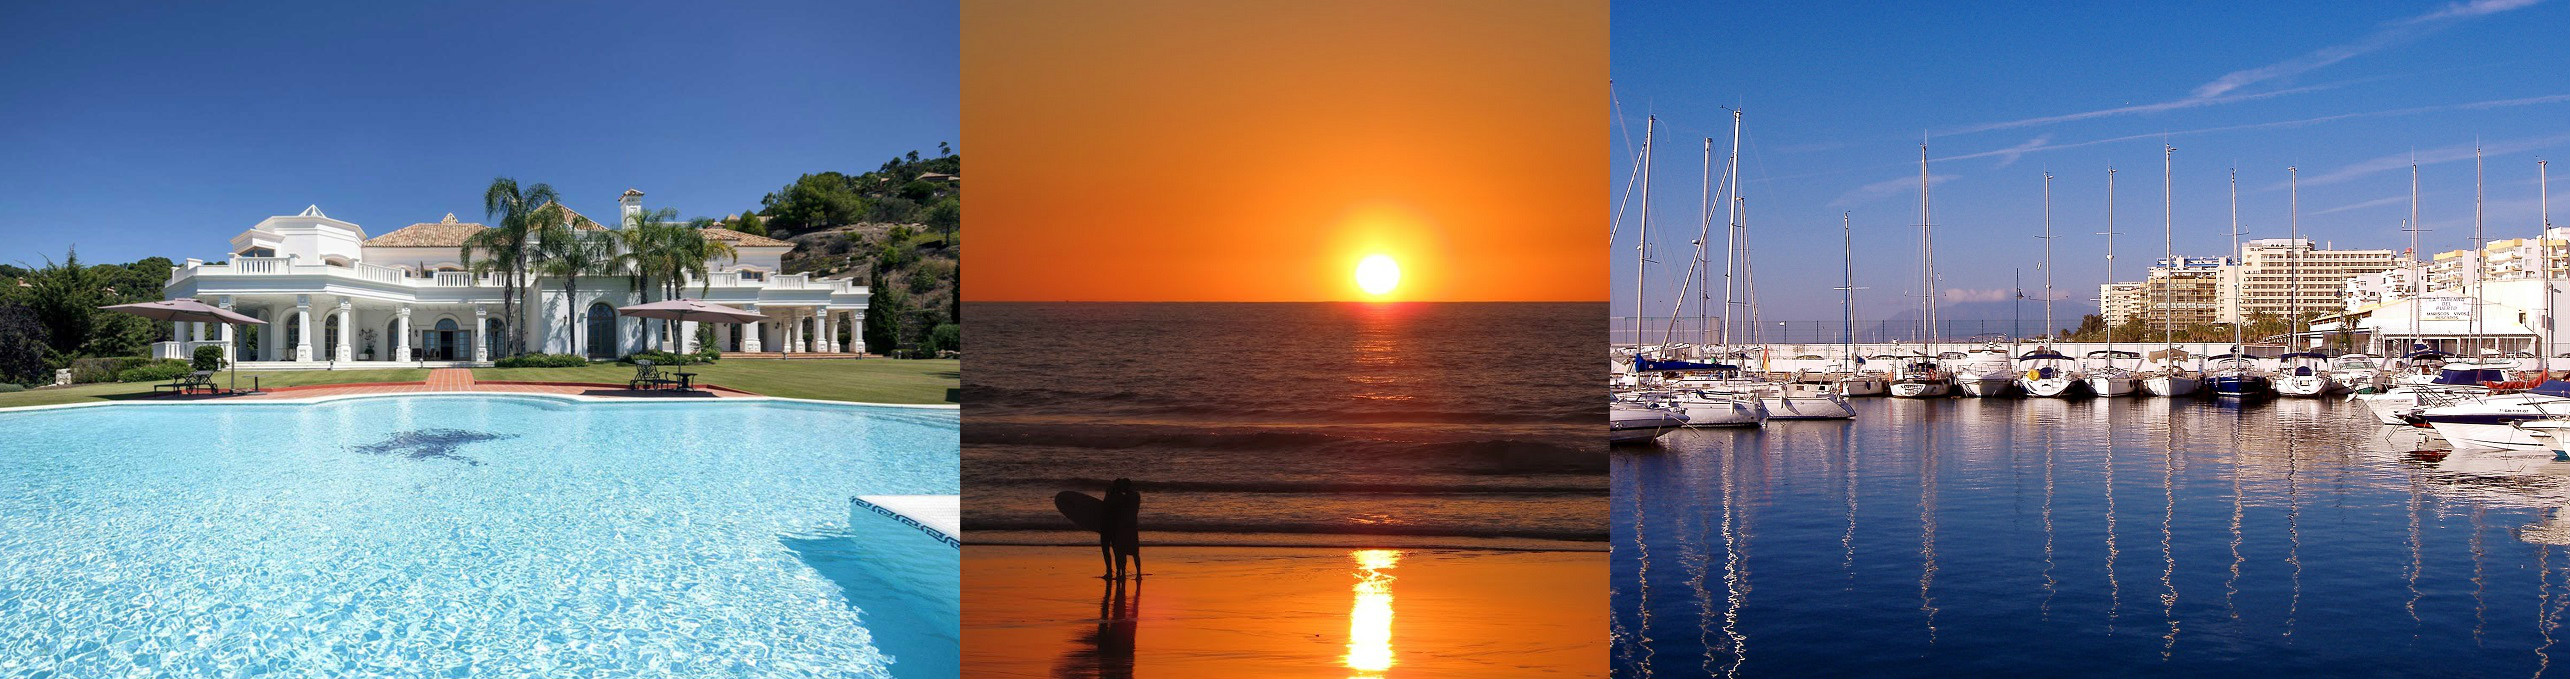 marbella-costa-del-sol-property-for-sale-oakham-high-street